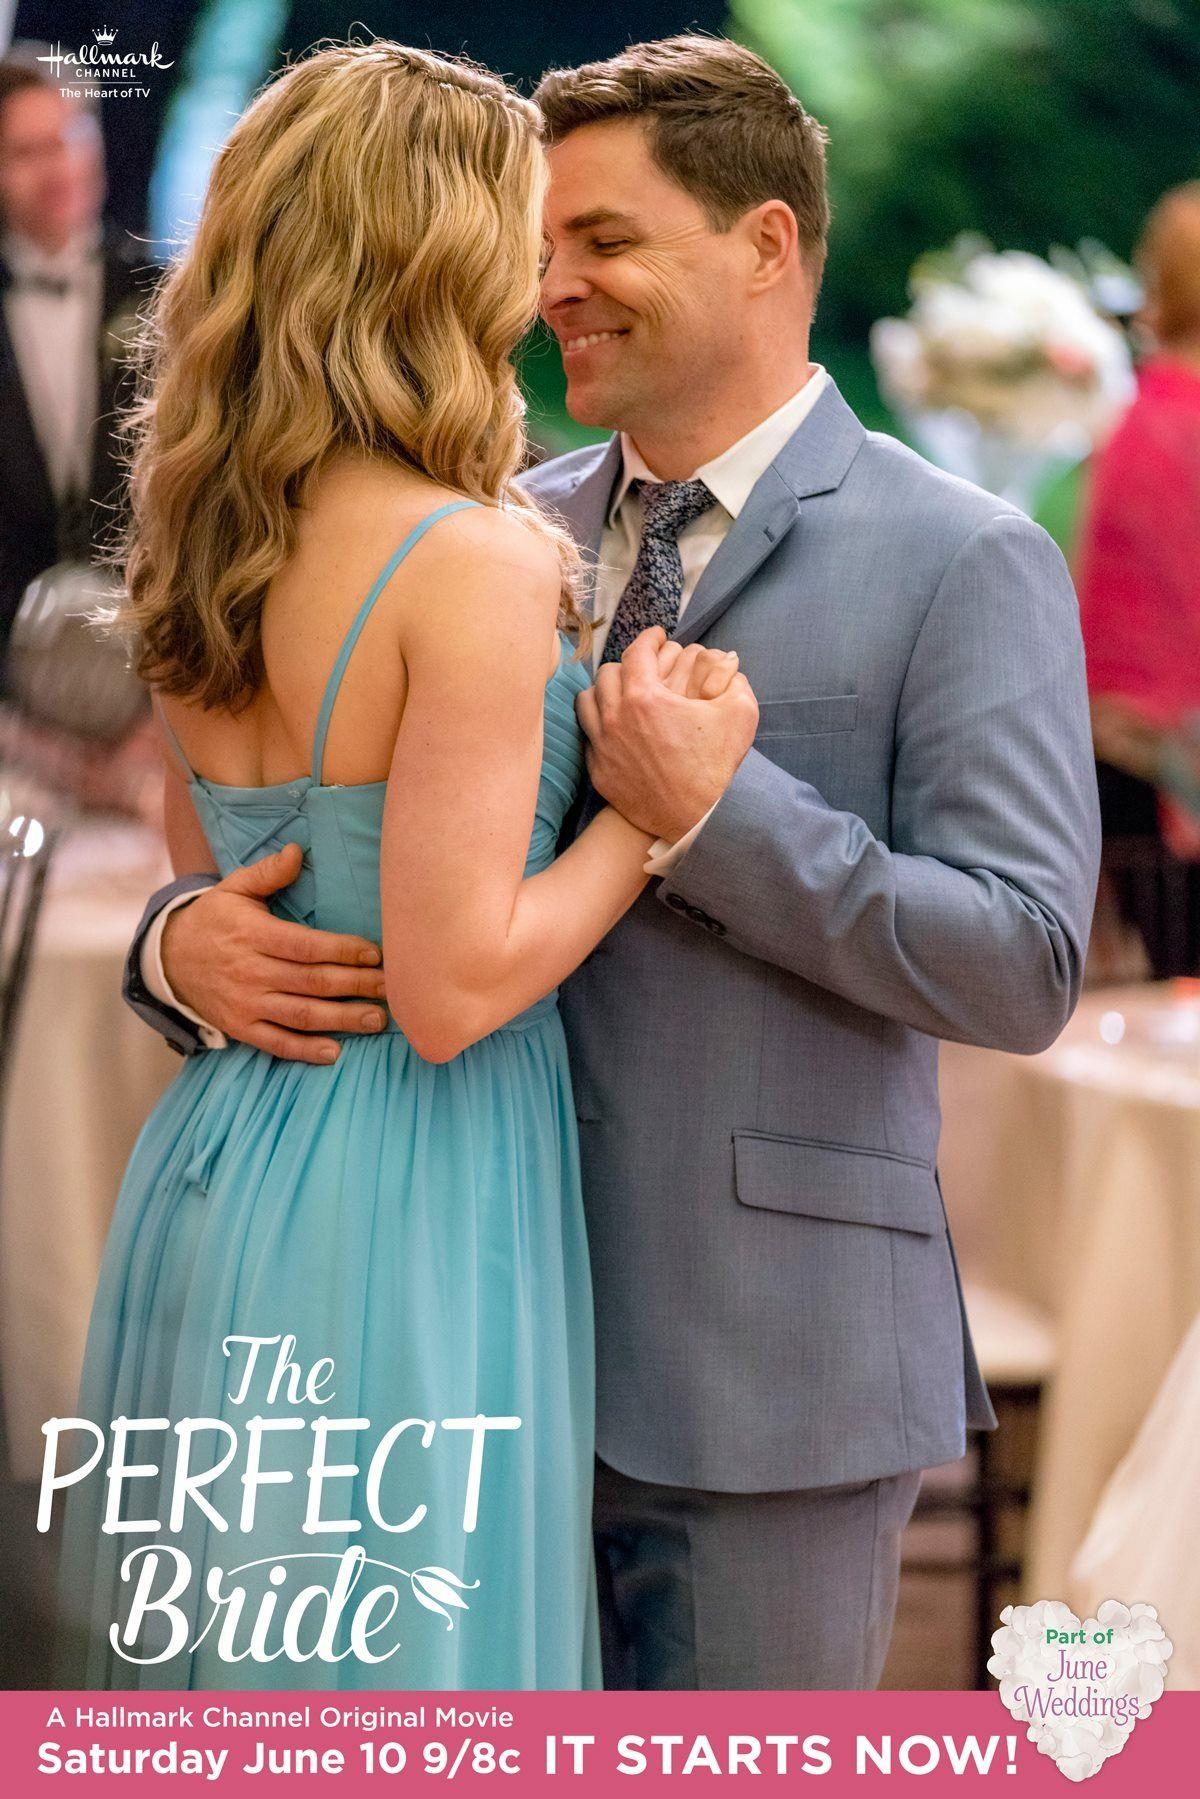 The Perfect Bride | Hallmark Movies in 2018 | Pinterest | Hallmark ...